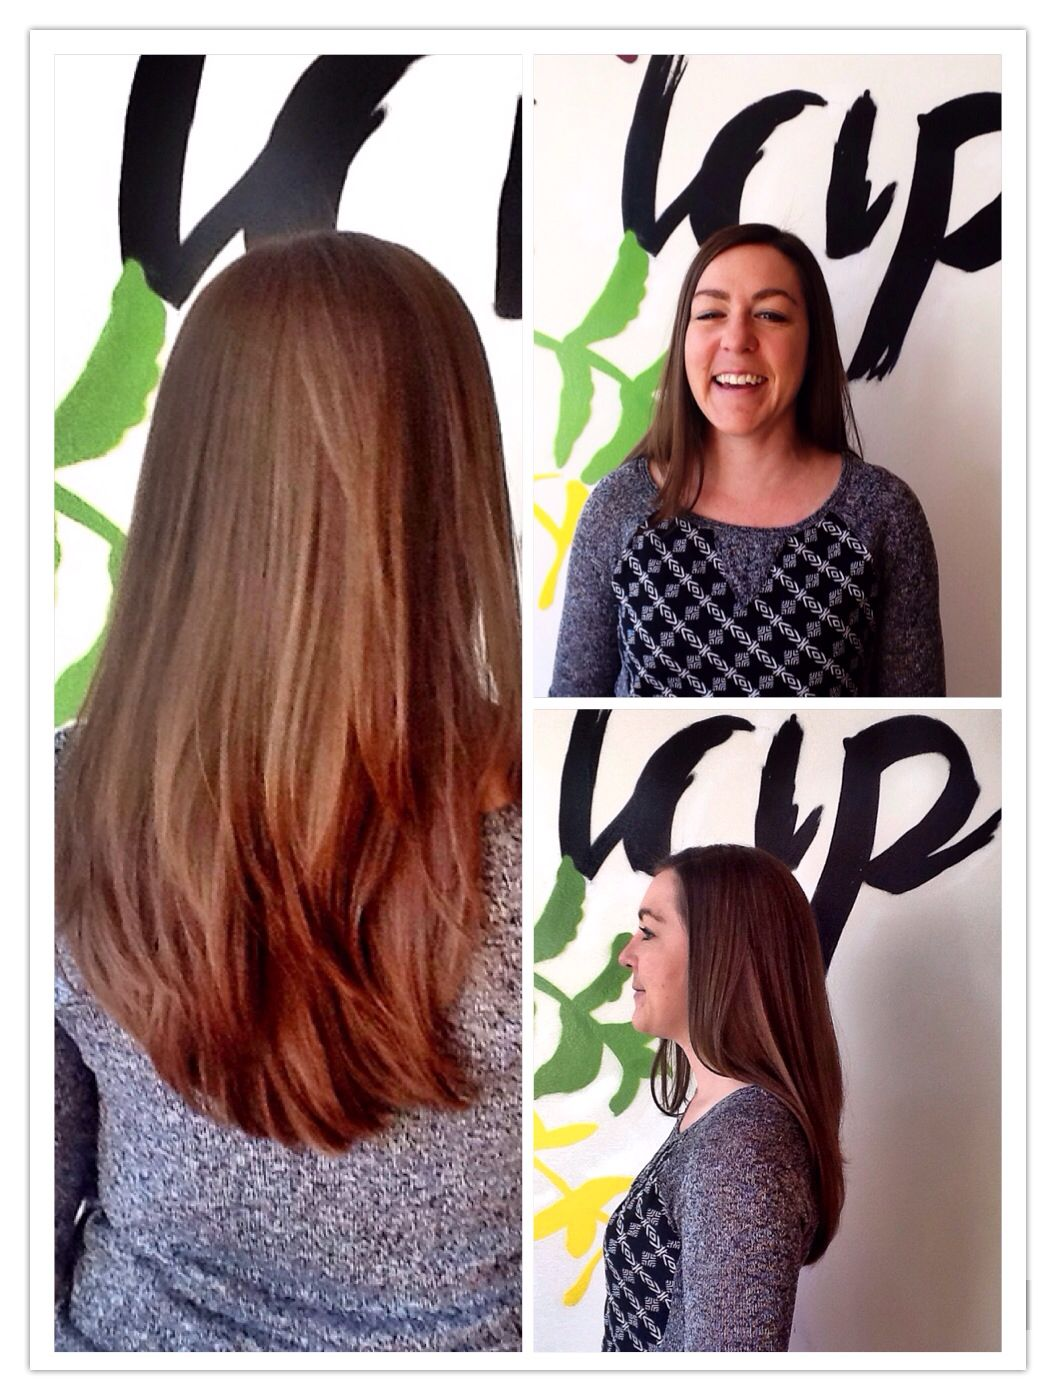 haircut by amber at my hair trip salon denver - thanks kerry! - long